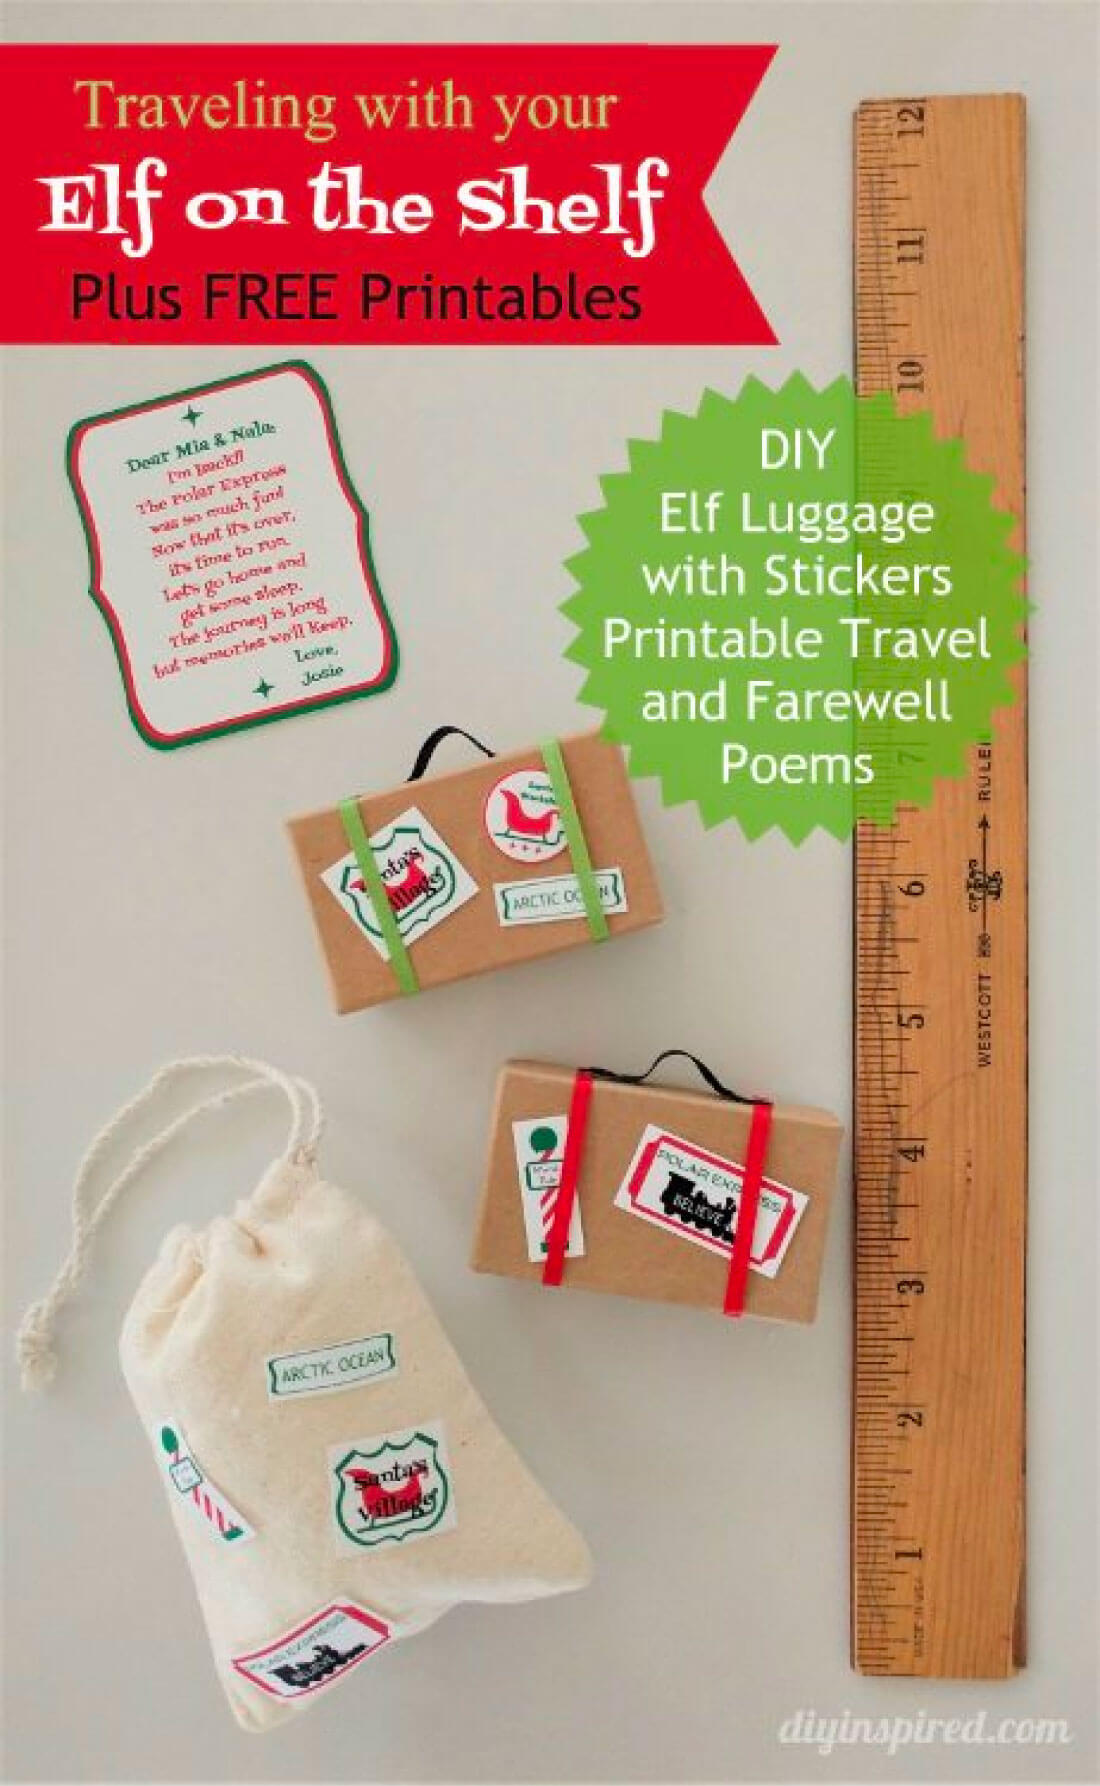 Printable Elf On The Shelf Ideas